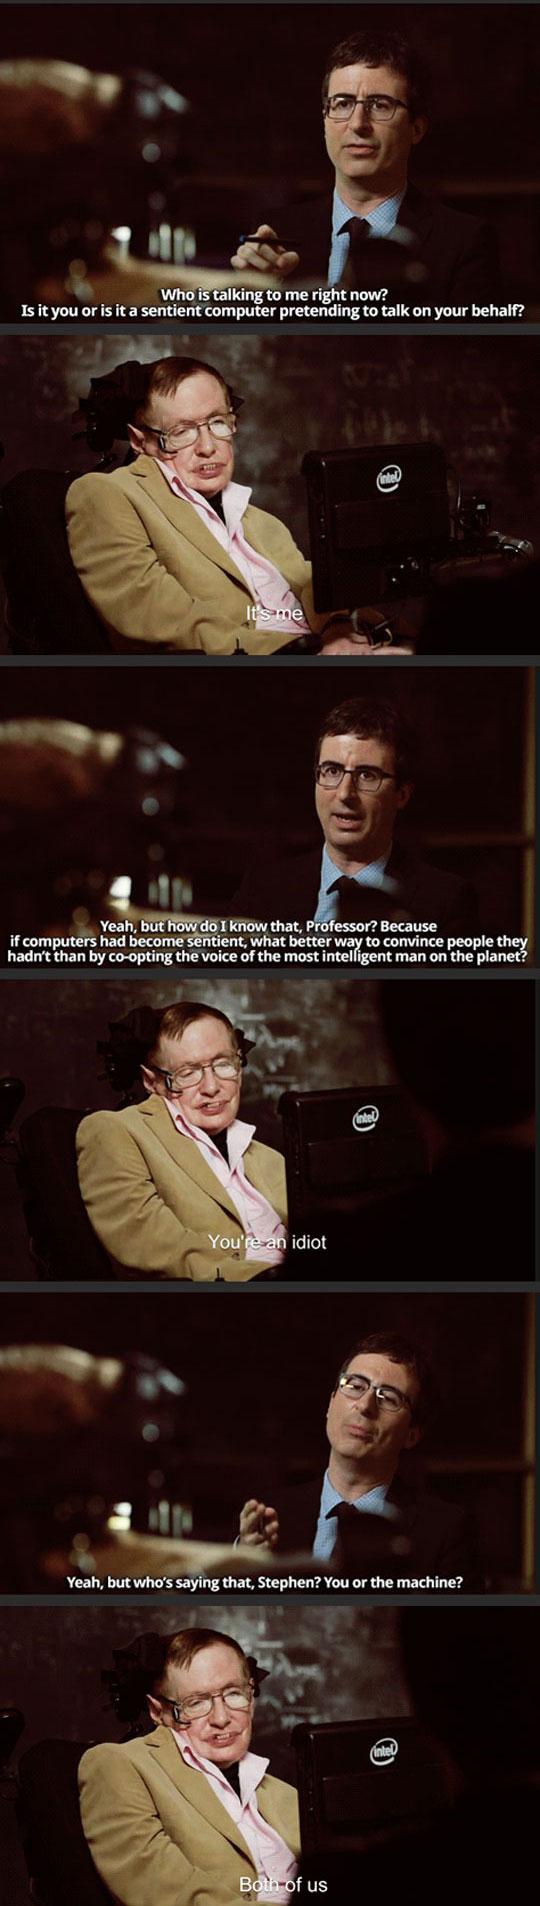 funny-Stephen-Hawking-John-Oliver-interview